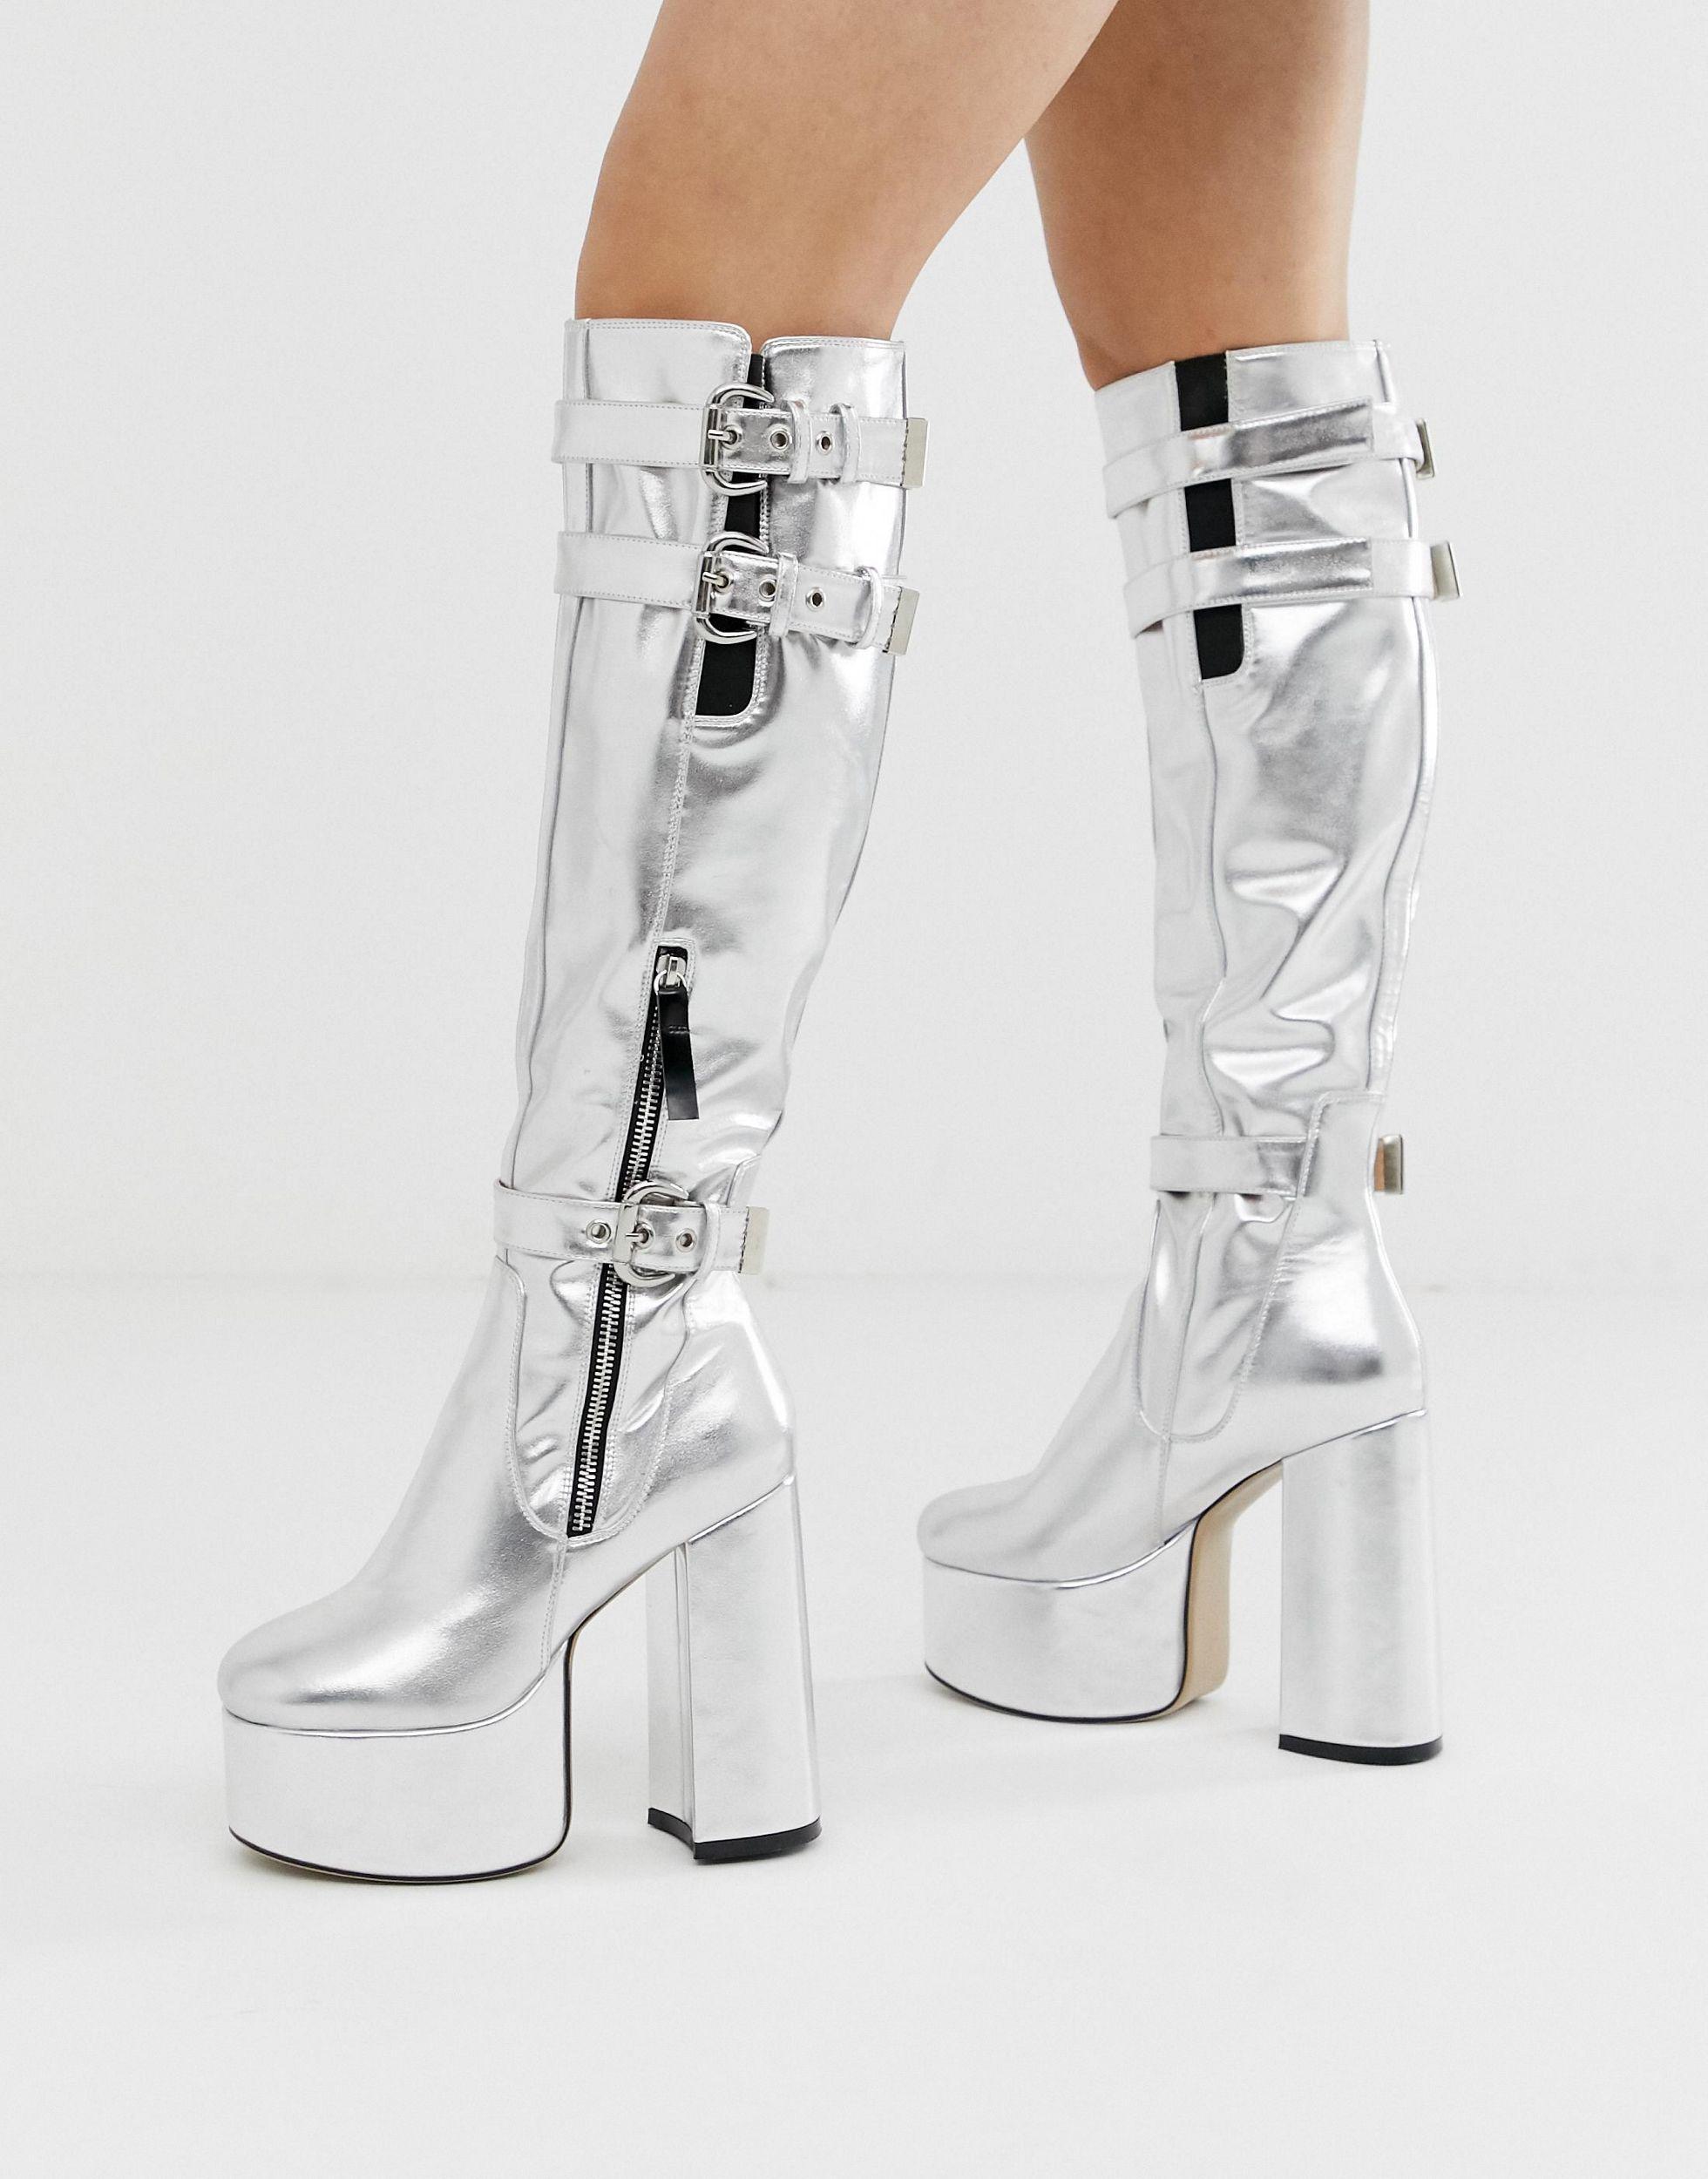 Silver Platform Knee High Boots